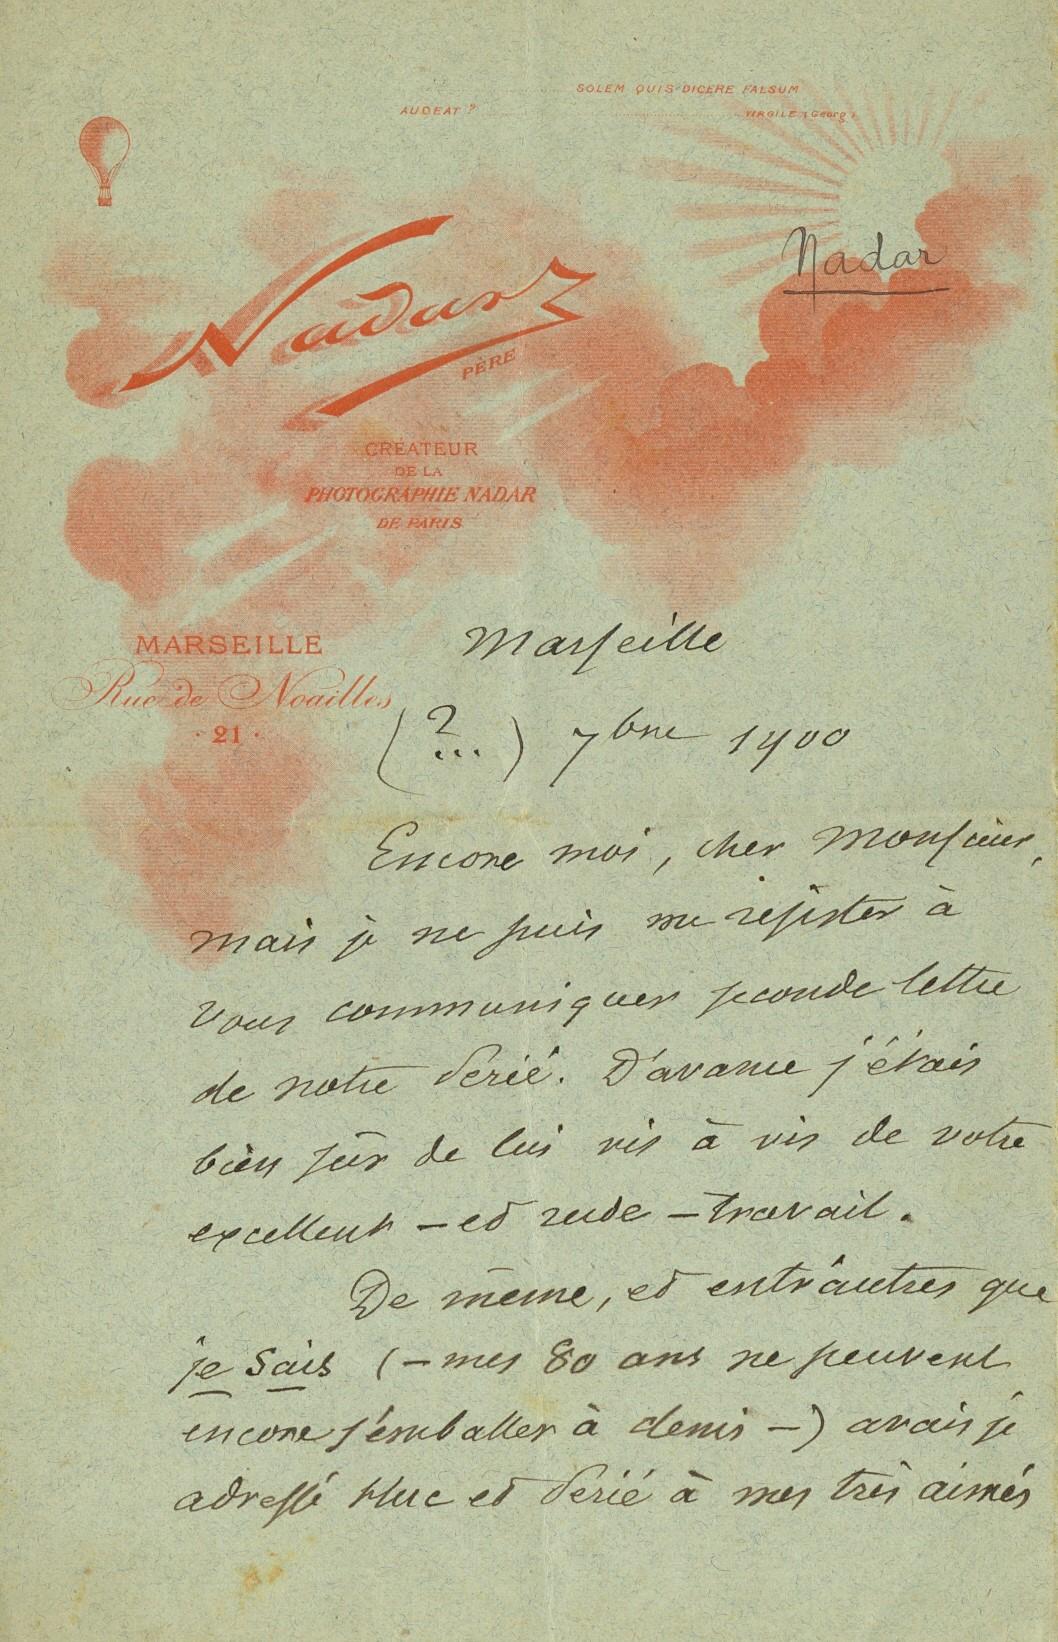 Lot 230 - NADAR: (1820-1910) French Photographer,